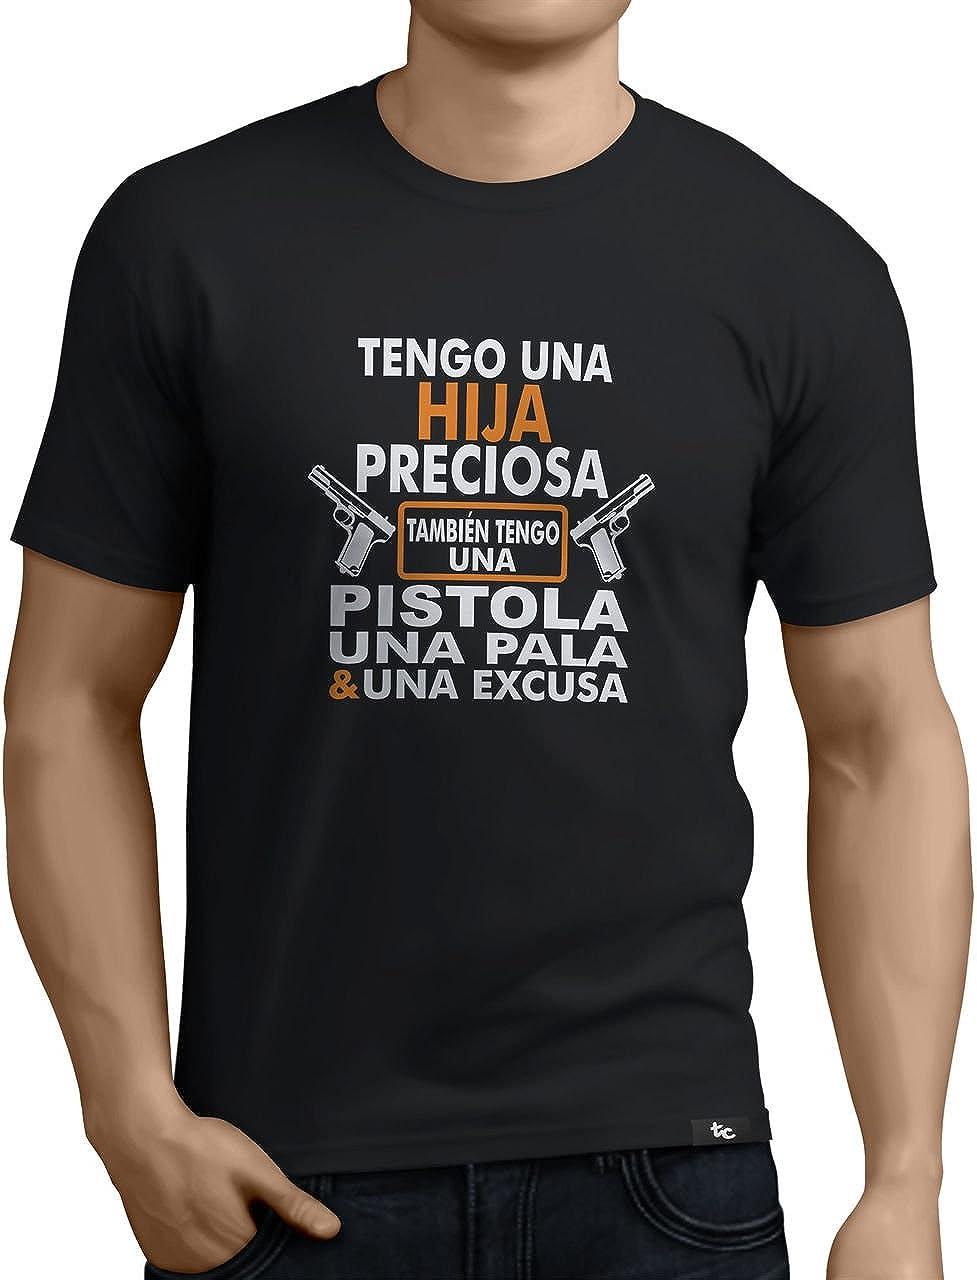 Tuning Camisetas - Camiseta Divertida para Hombre - Modelo Tengounahijapreciosa